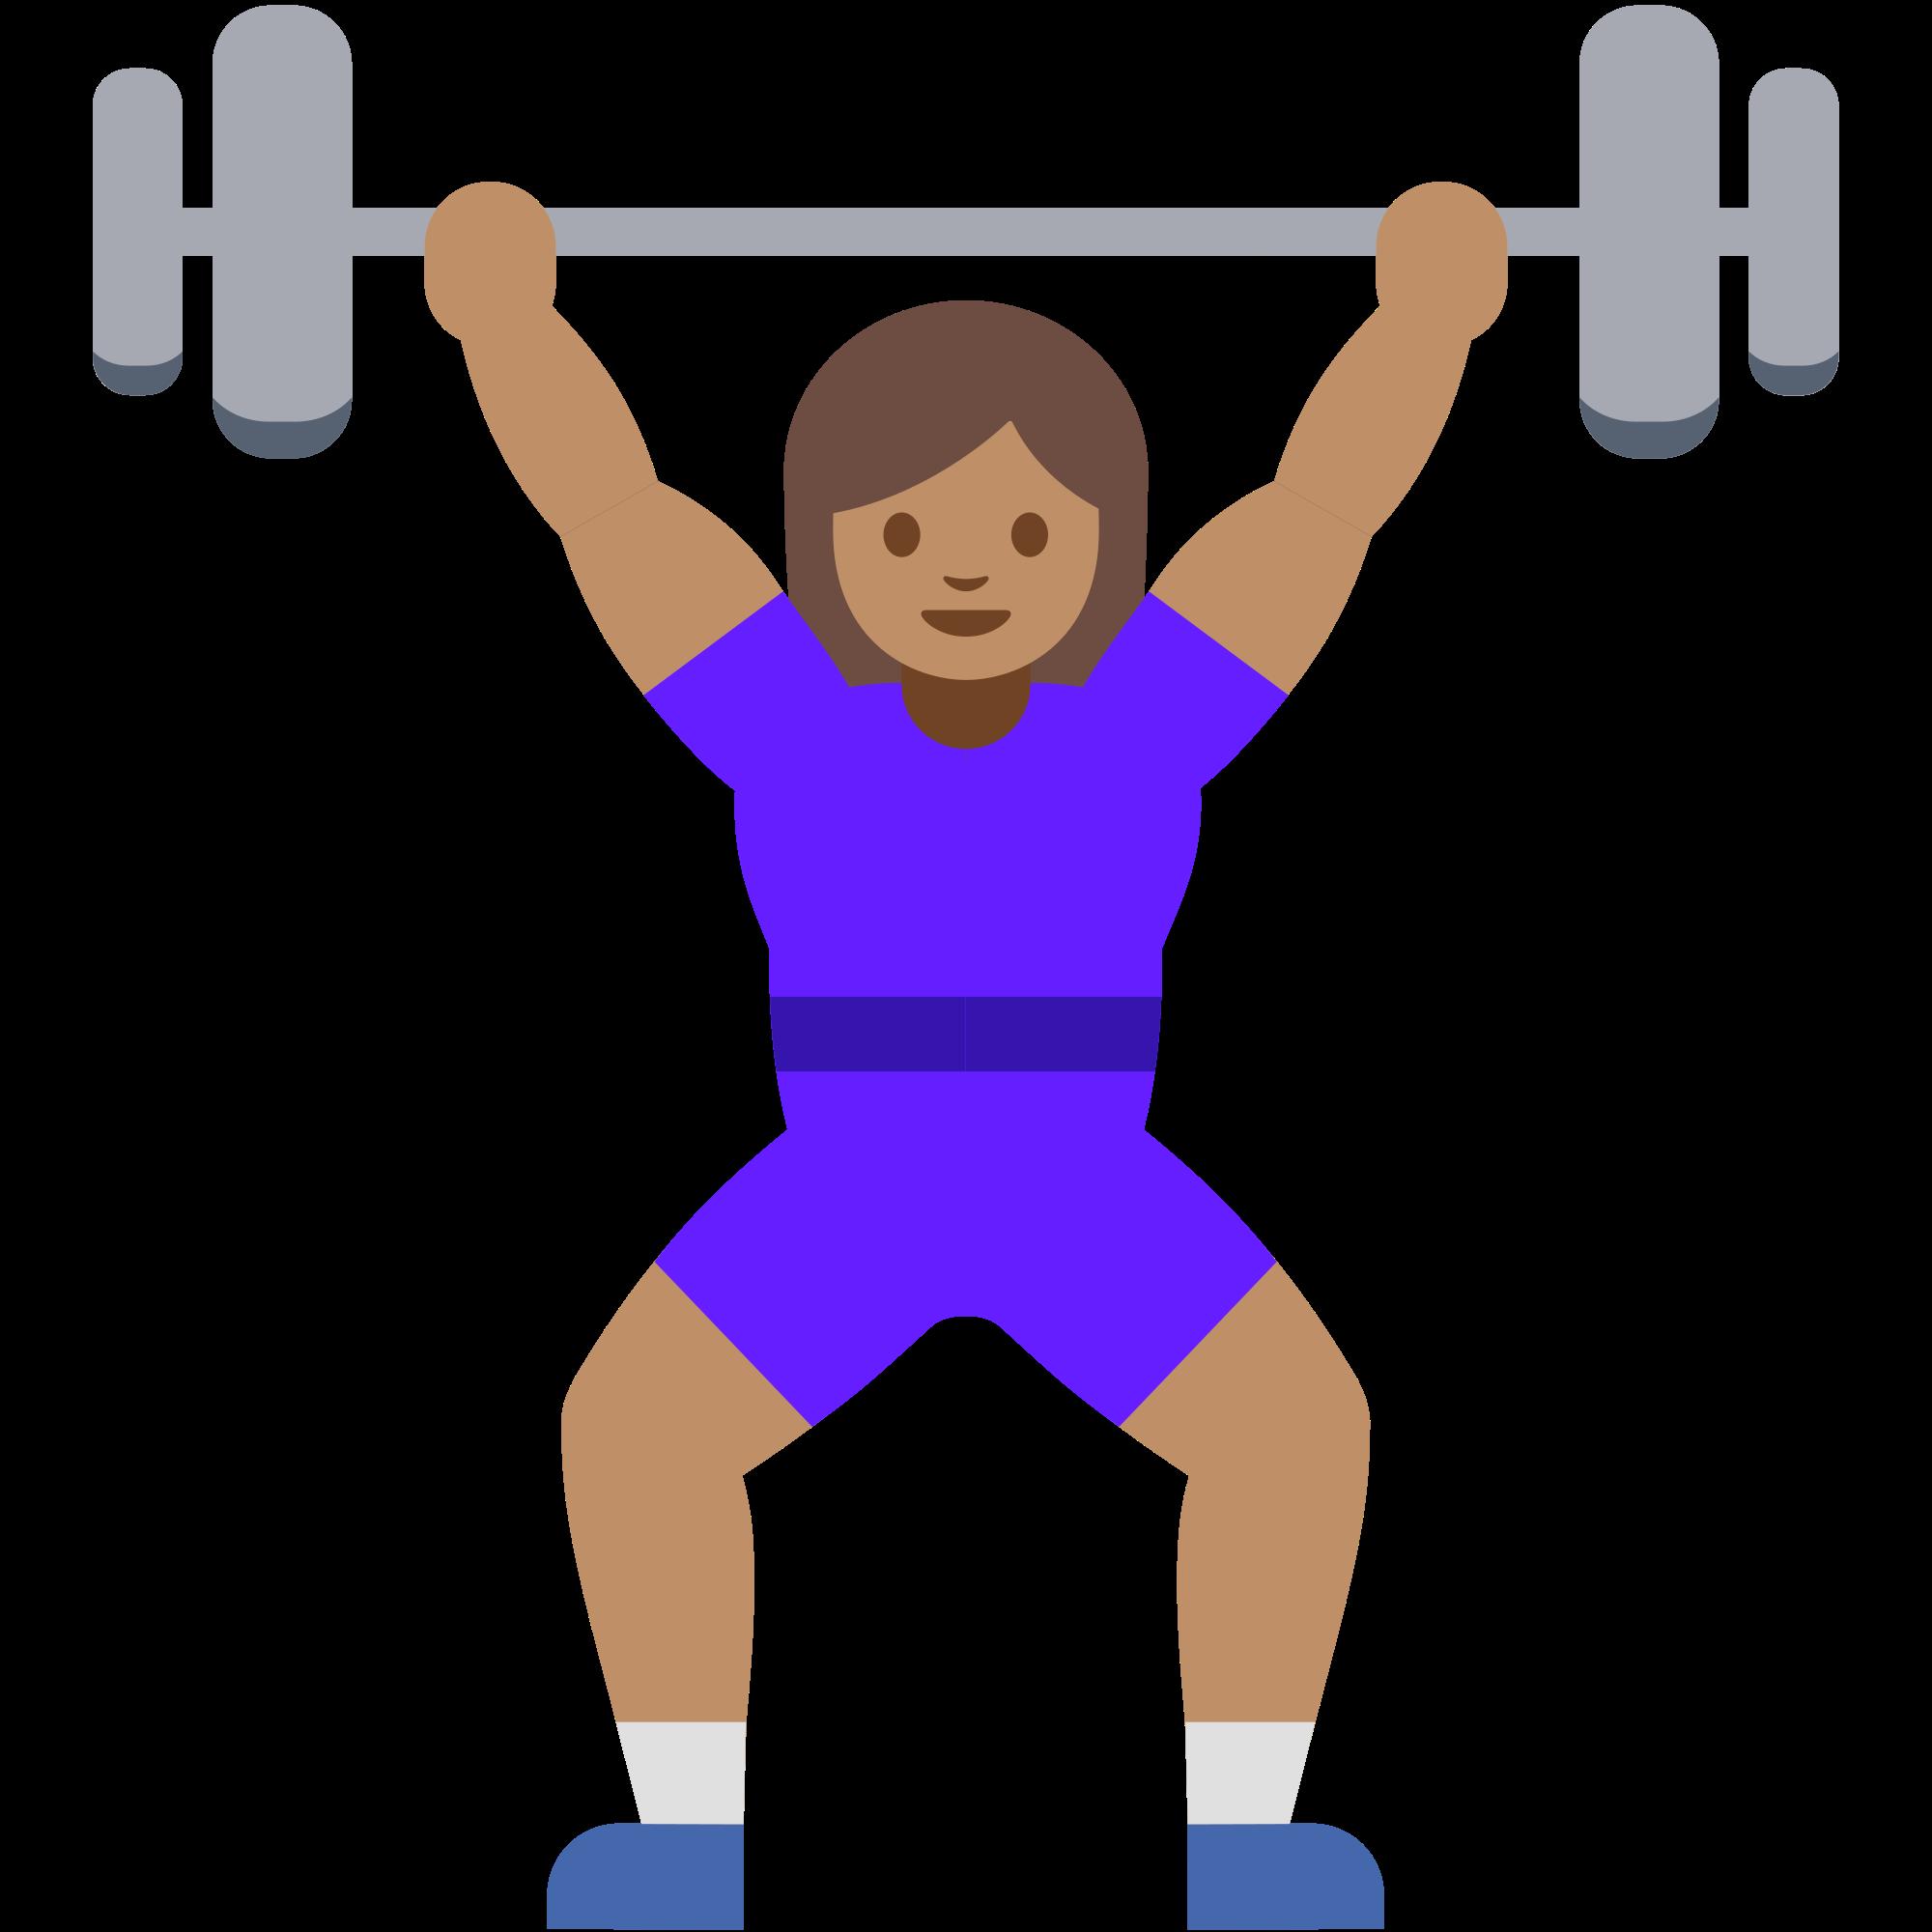 Volleyball clipart emoji. File u f cb